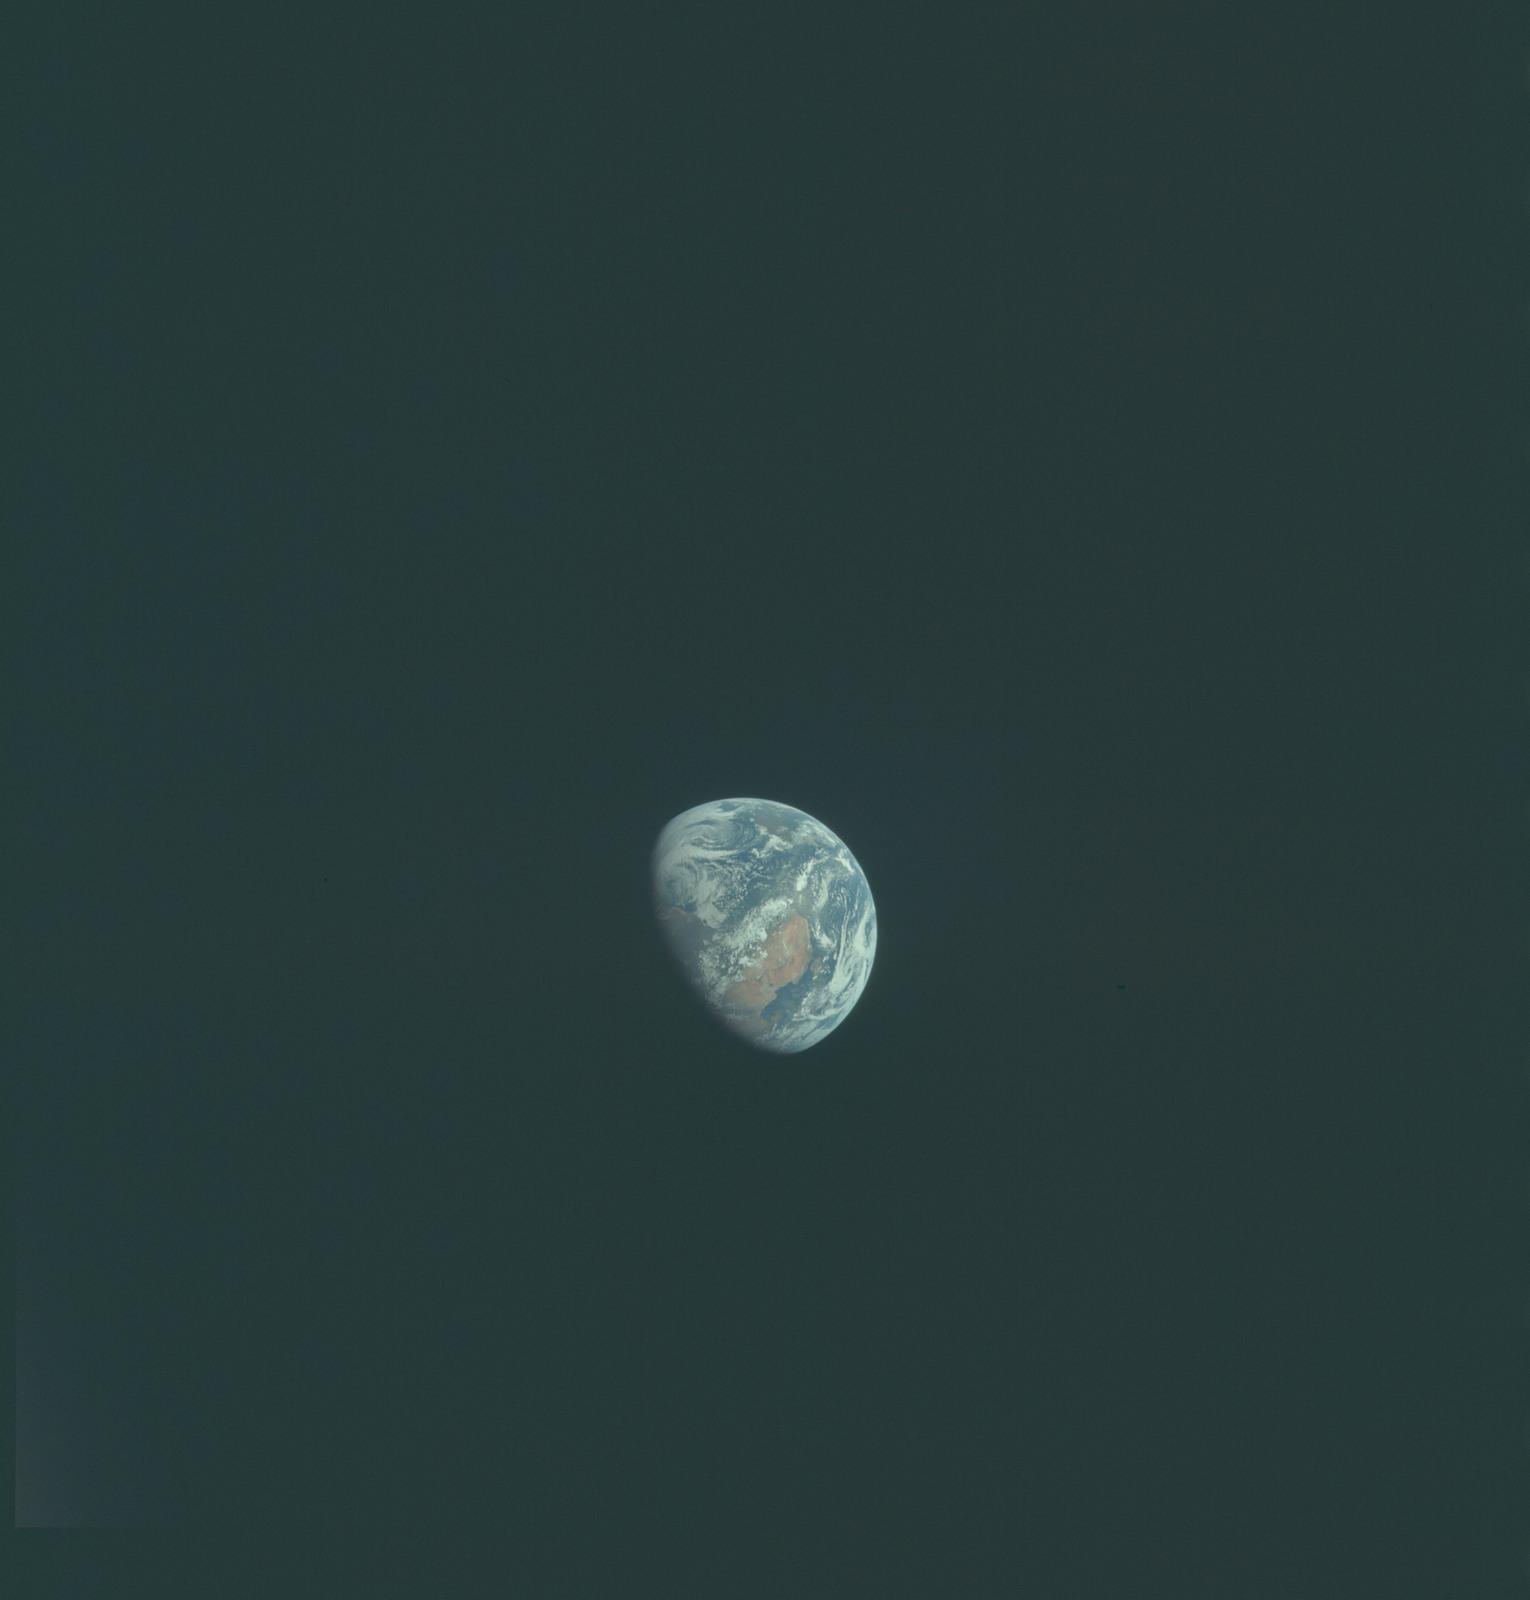 AS11-36-5378 - Apollo 11 - Apollo 11 Mission image - Earth view over Africa